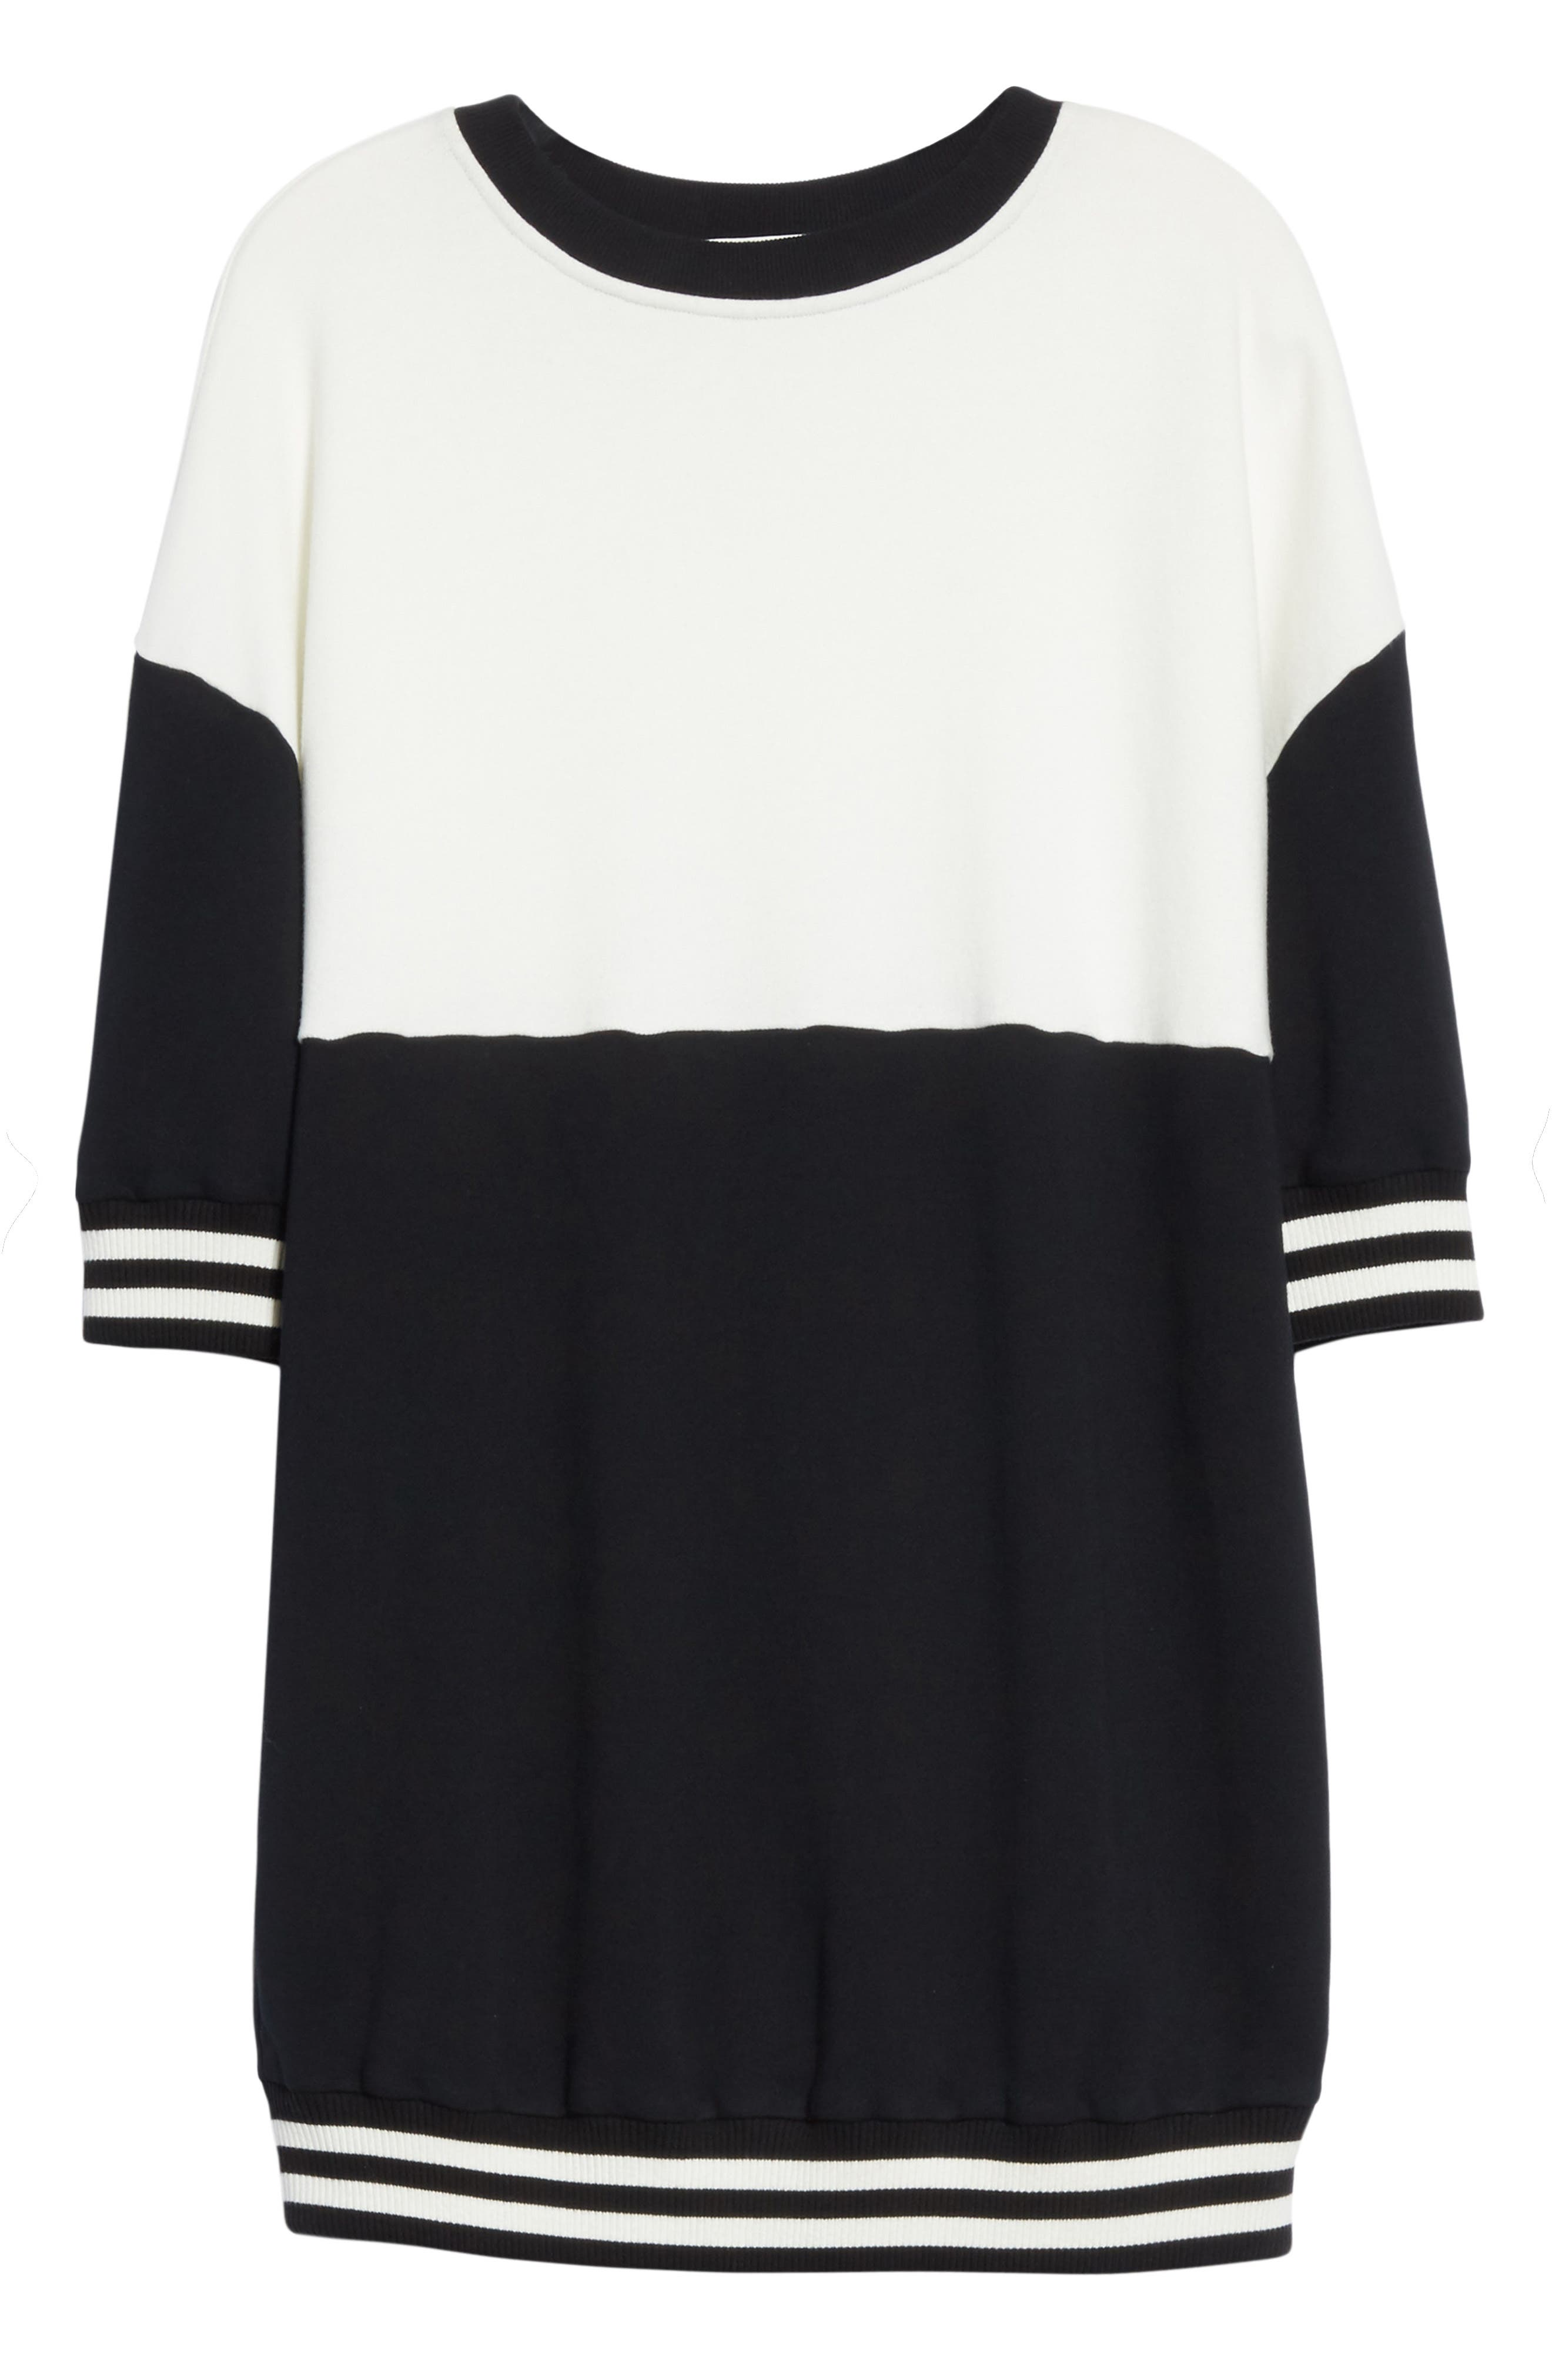 Gussie Colorblock Sweatshirt Dress,                             Alternate thumbnail 6, color,                             008